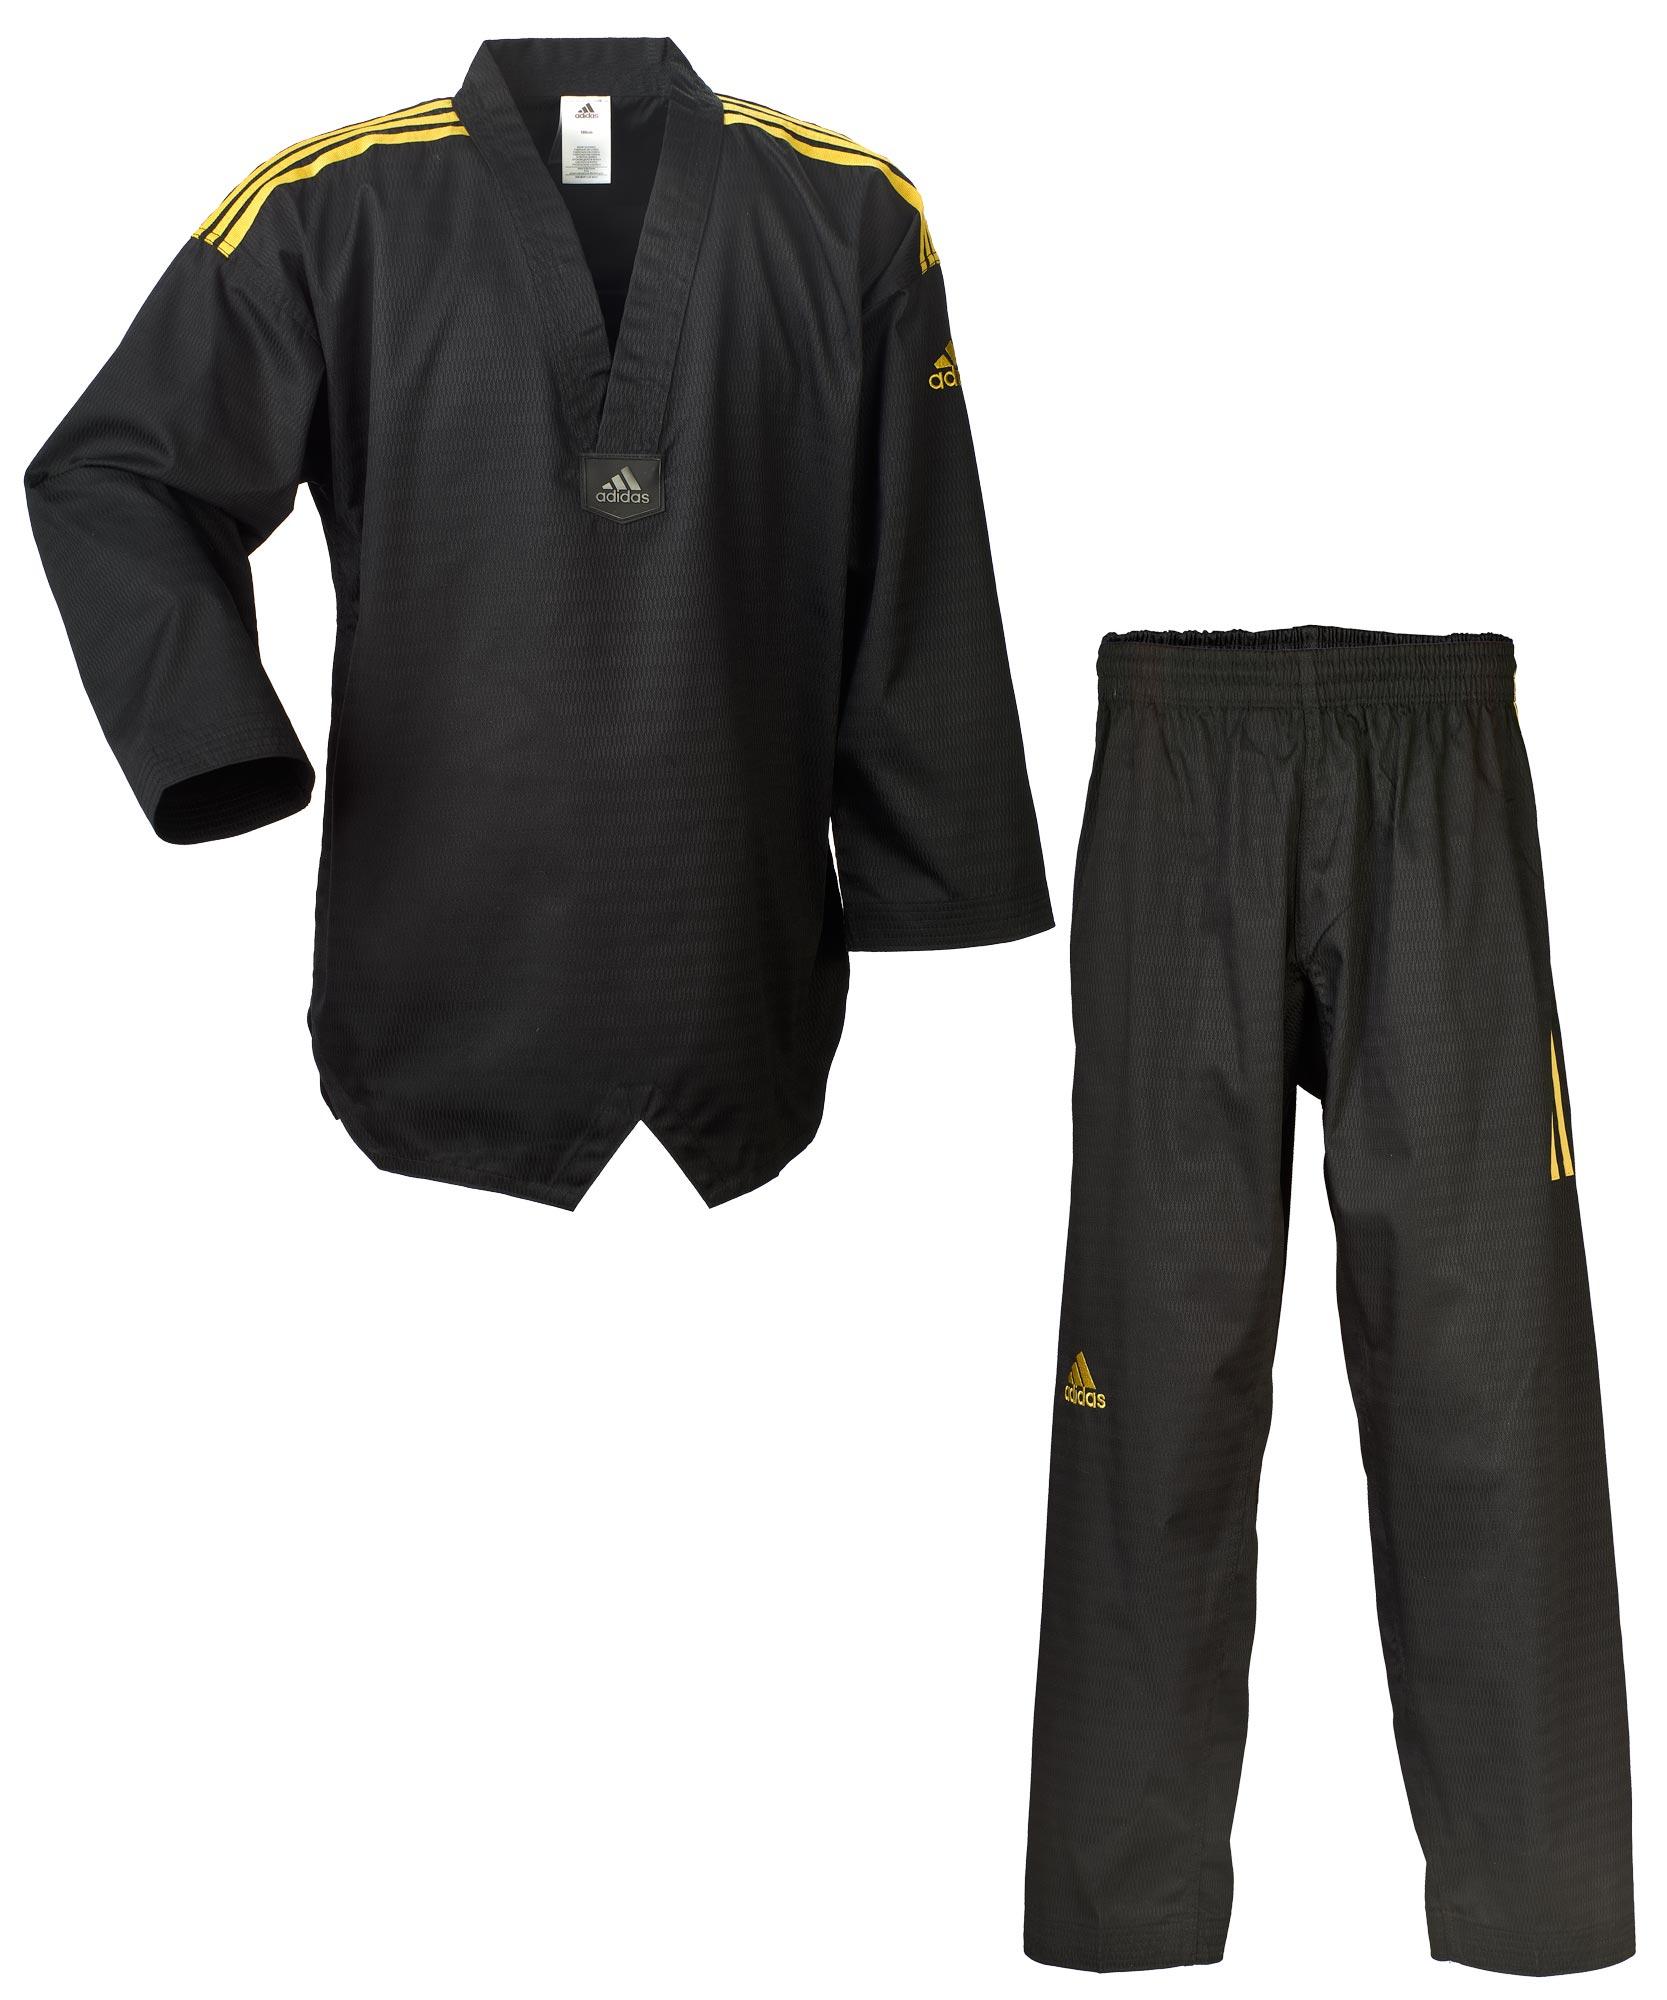 adidas Taekwondoanzug adi champion